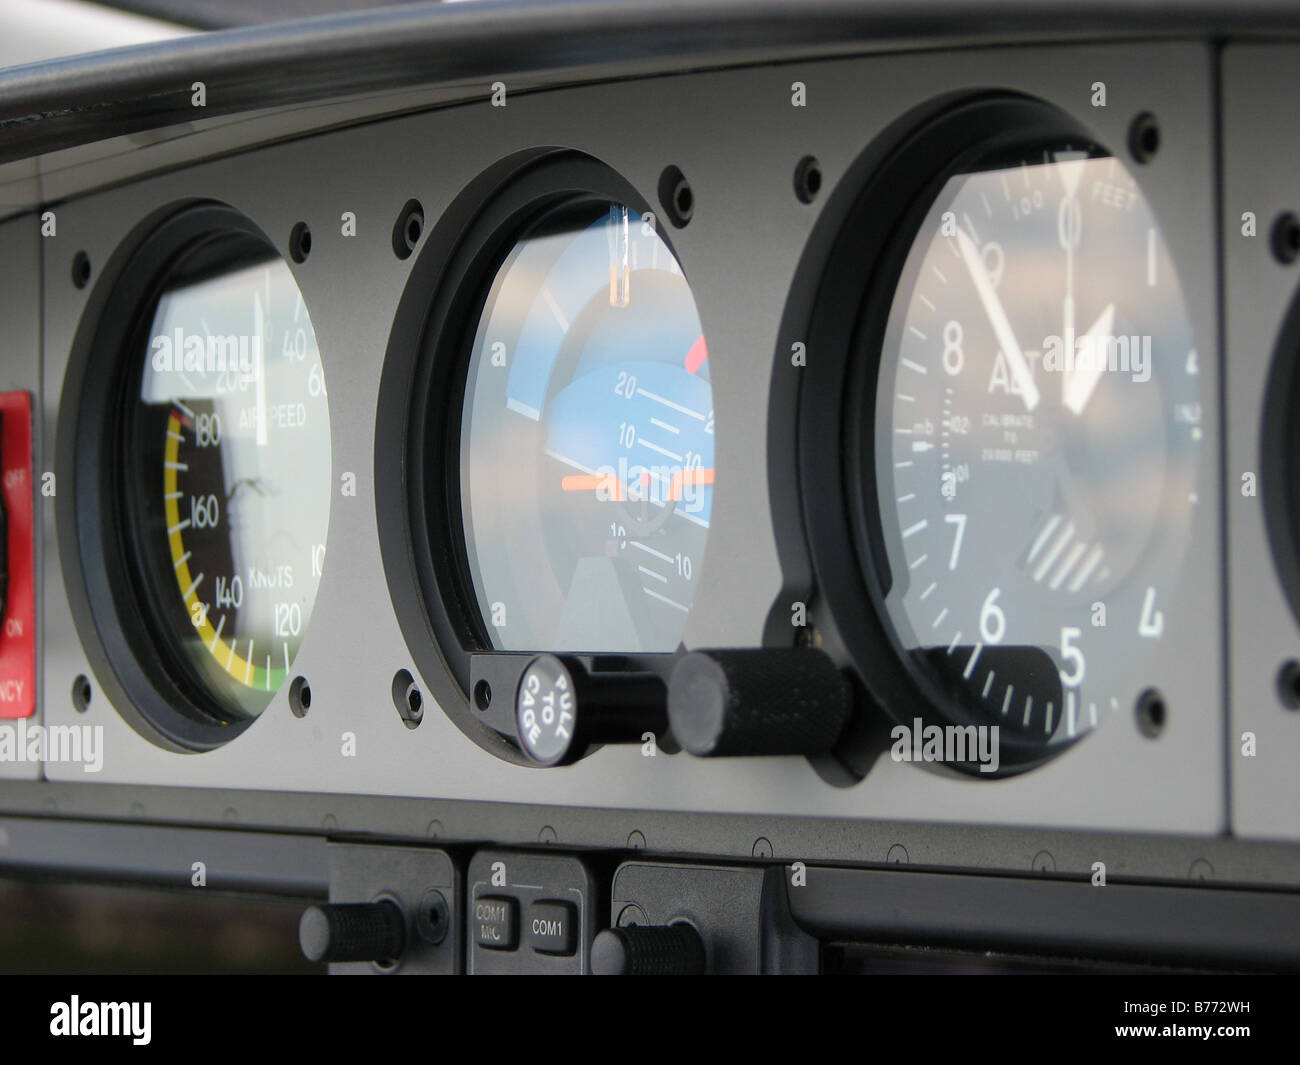 Flight Instruments Stock Photos & Flight Instruments Stock